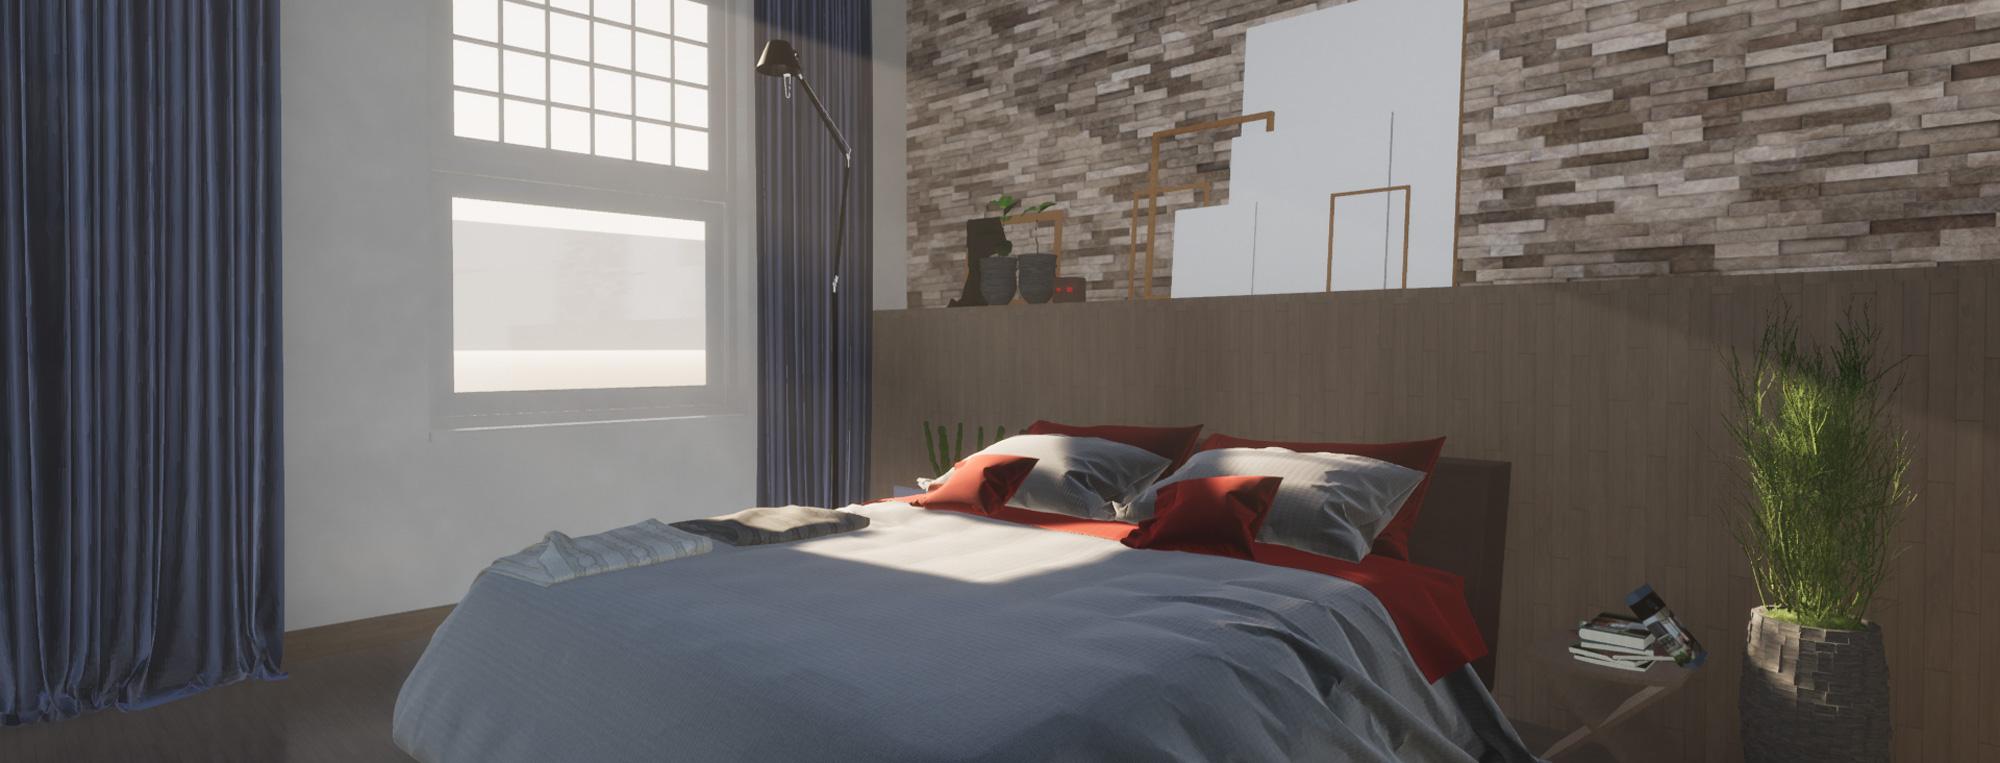 Dyade - Projet Chambre Twin